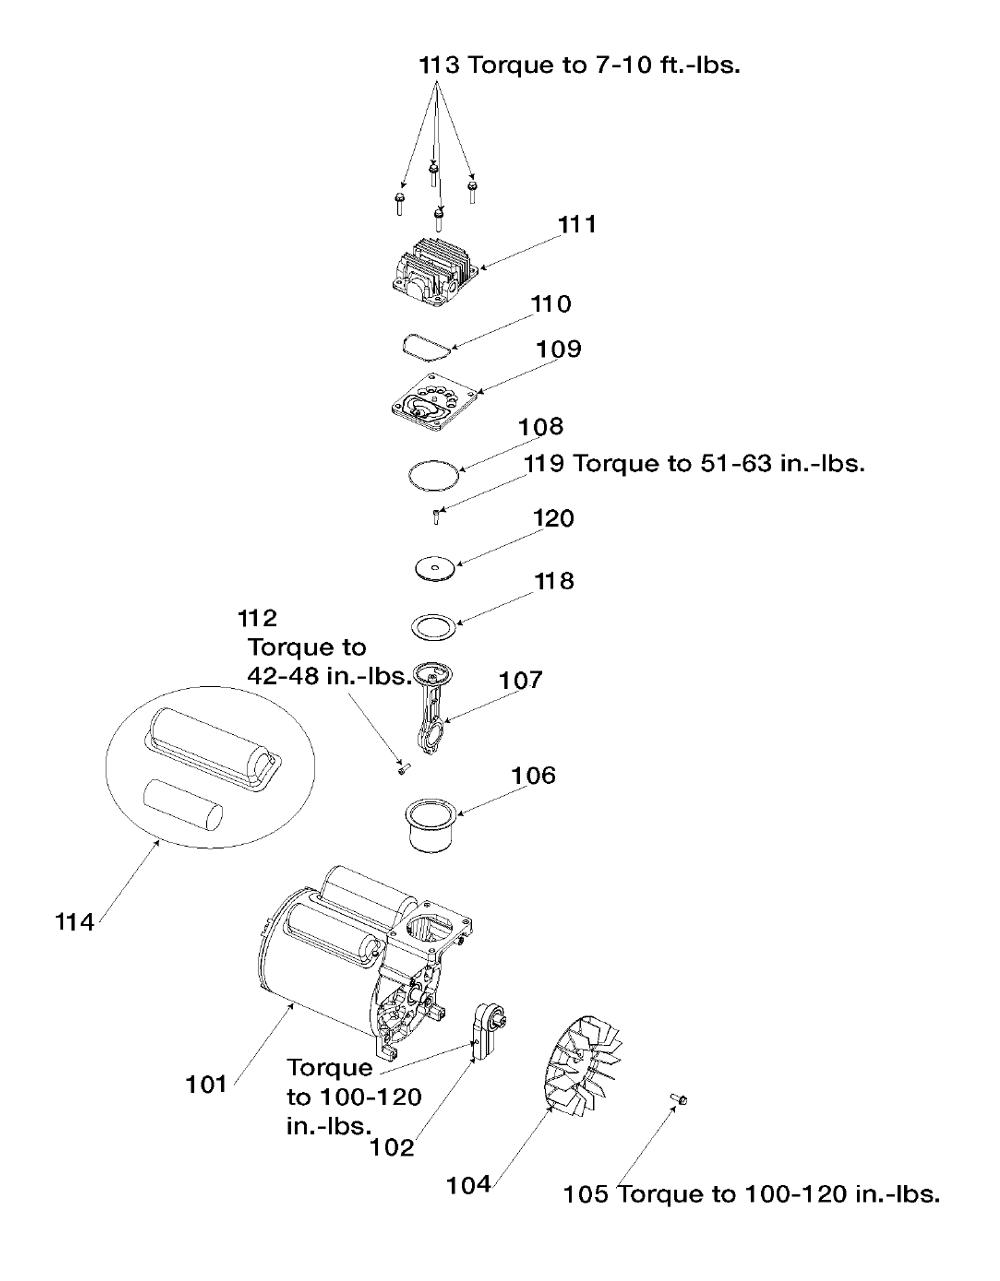 CFFR350C-Porter-Cable-T0-PB-1Break Down